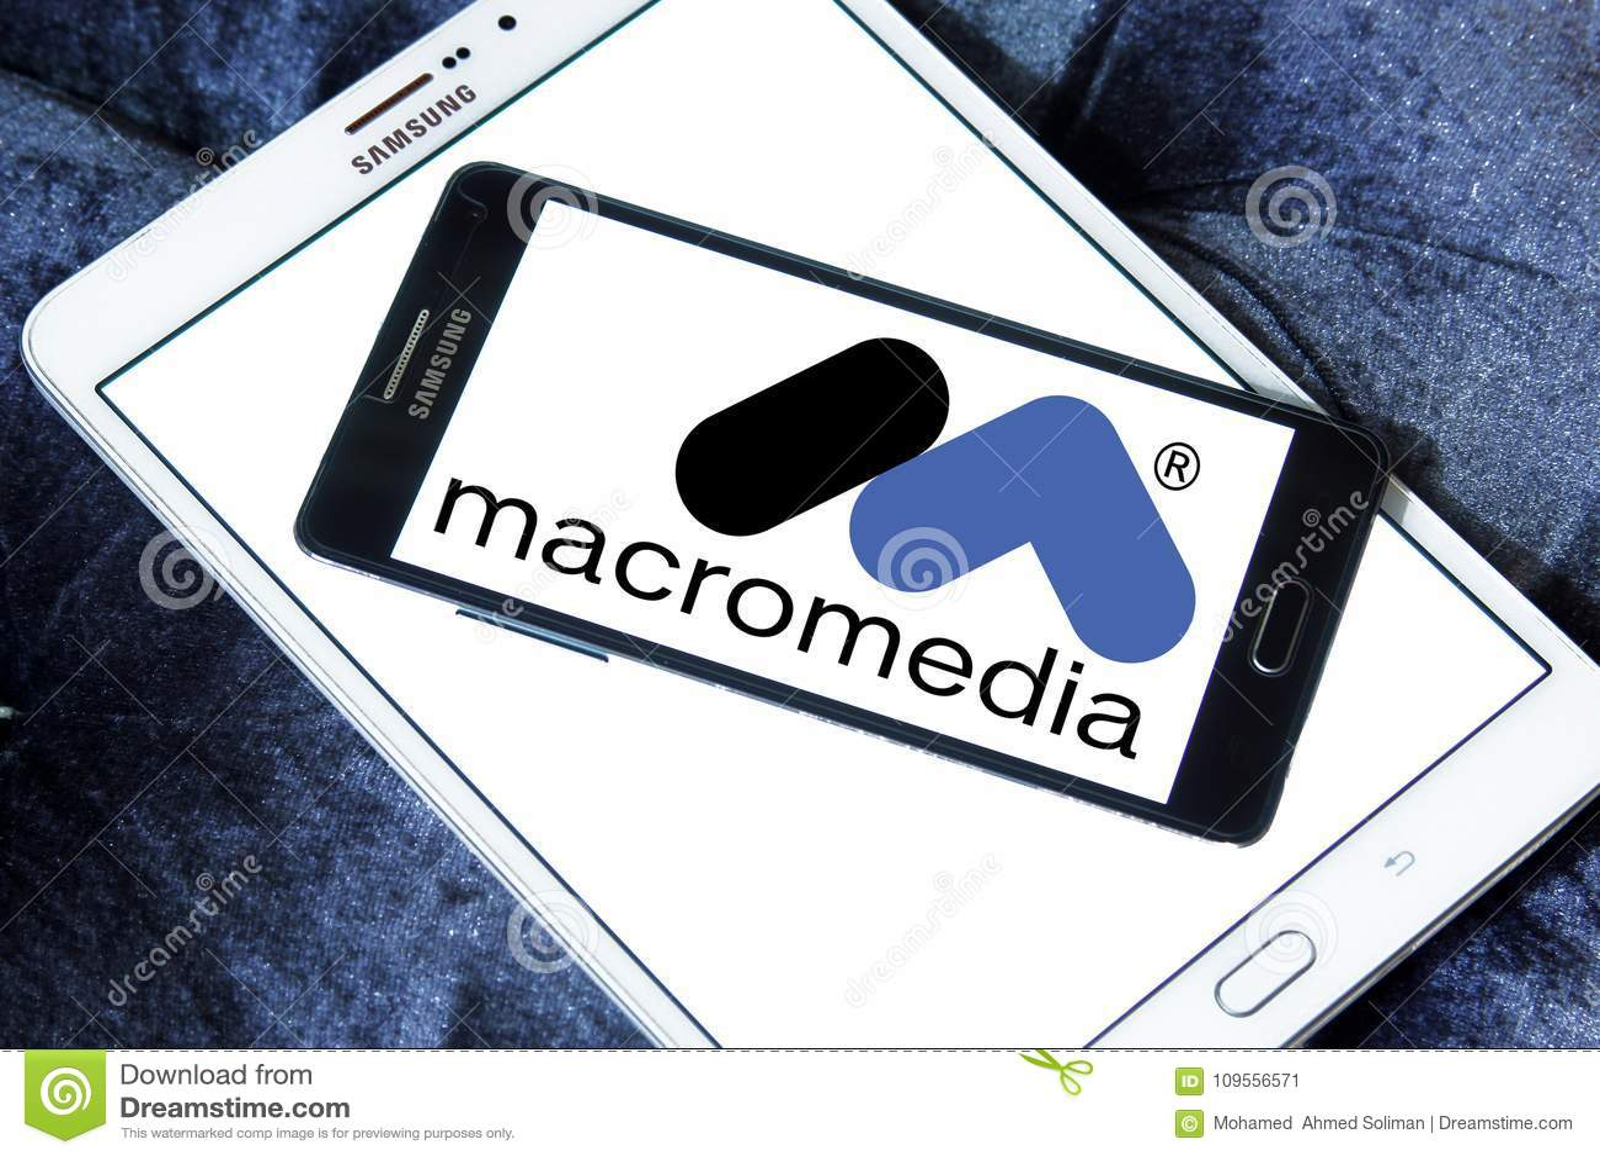 Macromedia Software Company Logo Editorial Photo - Image of